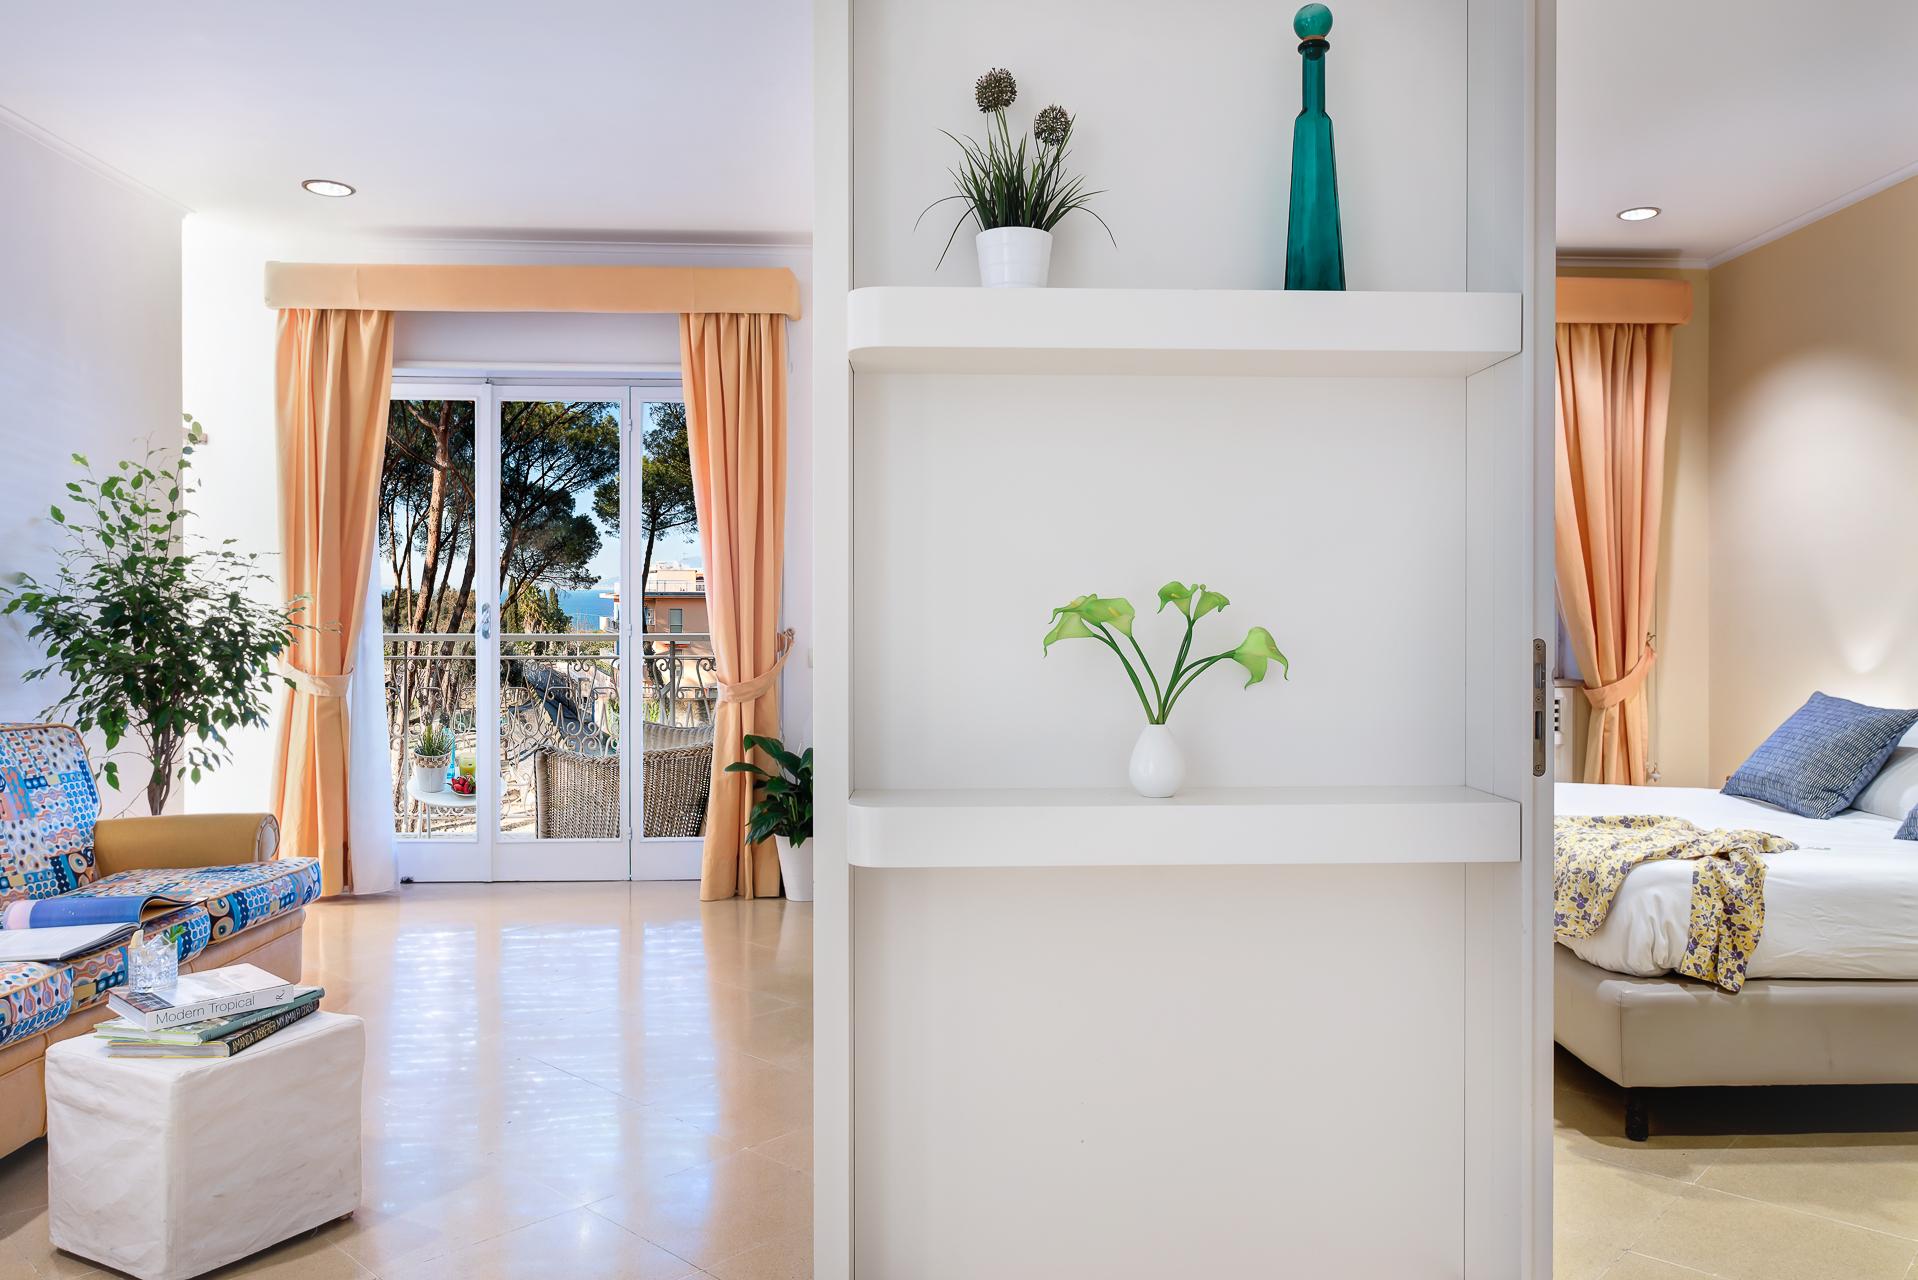 El Royale Suites Sorrento - Gold photo 20142604